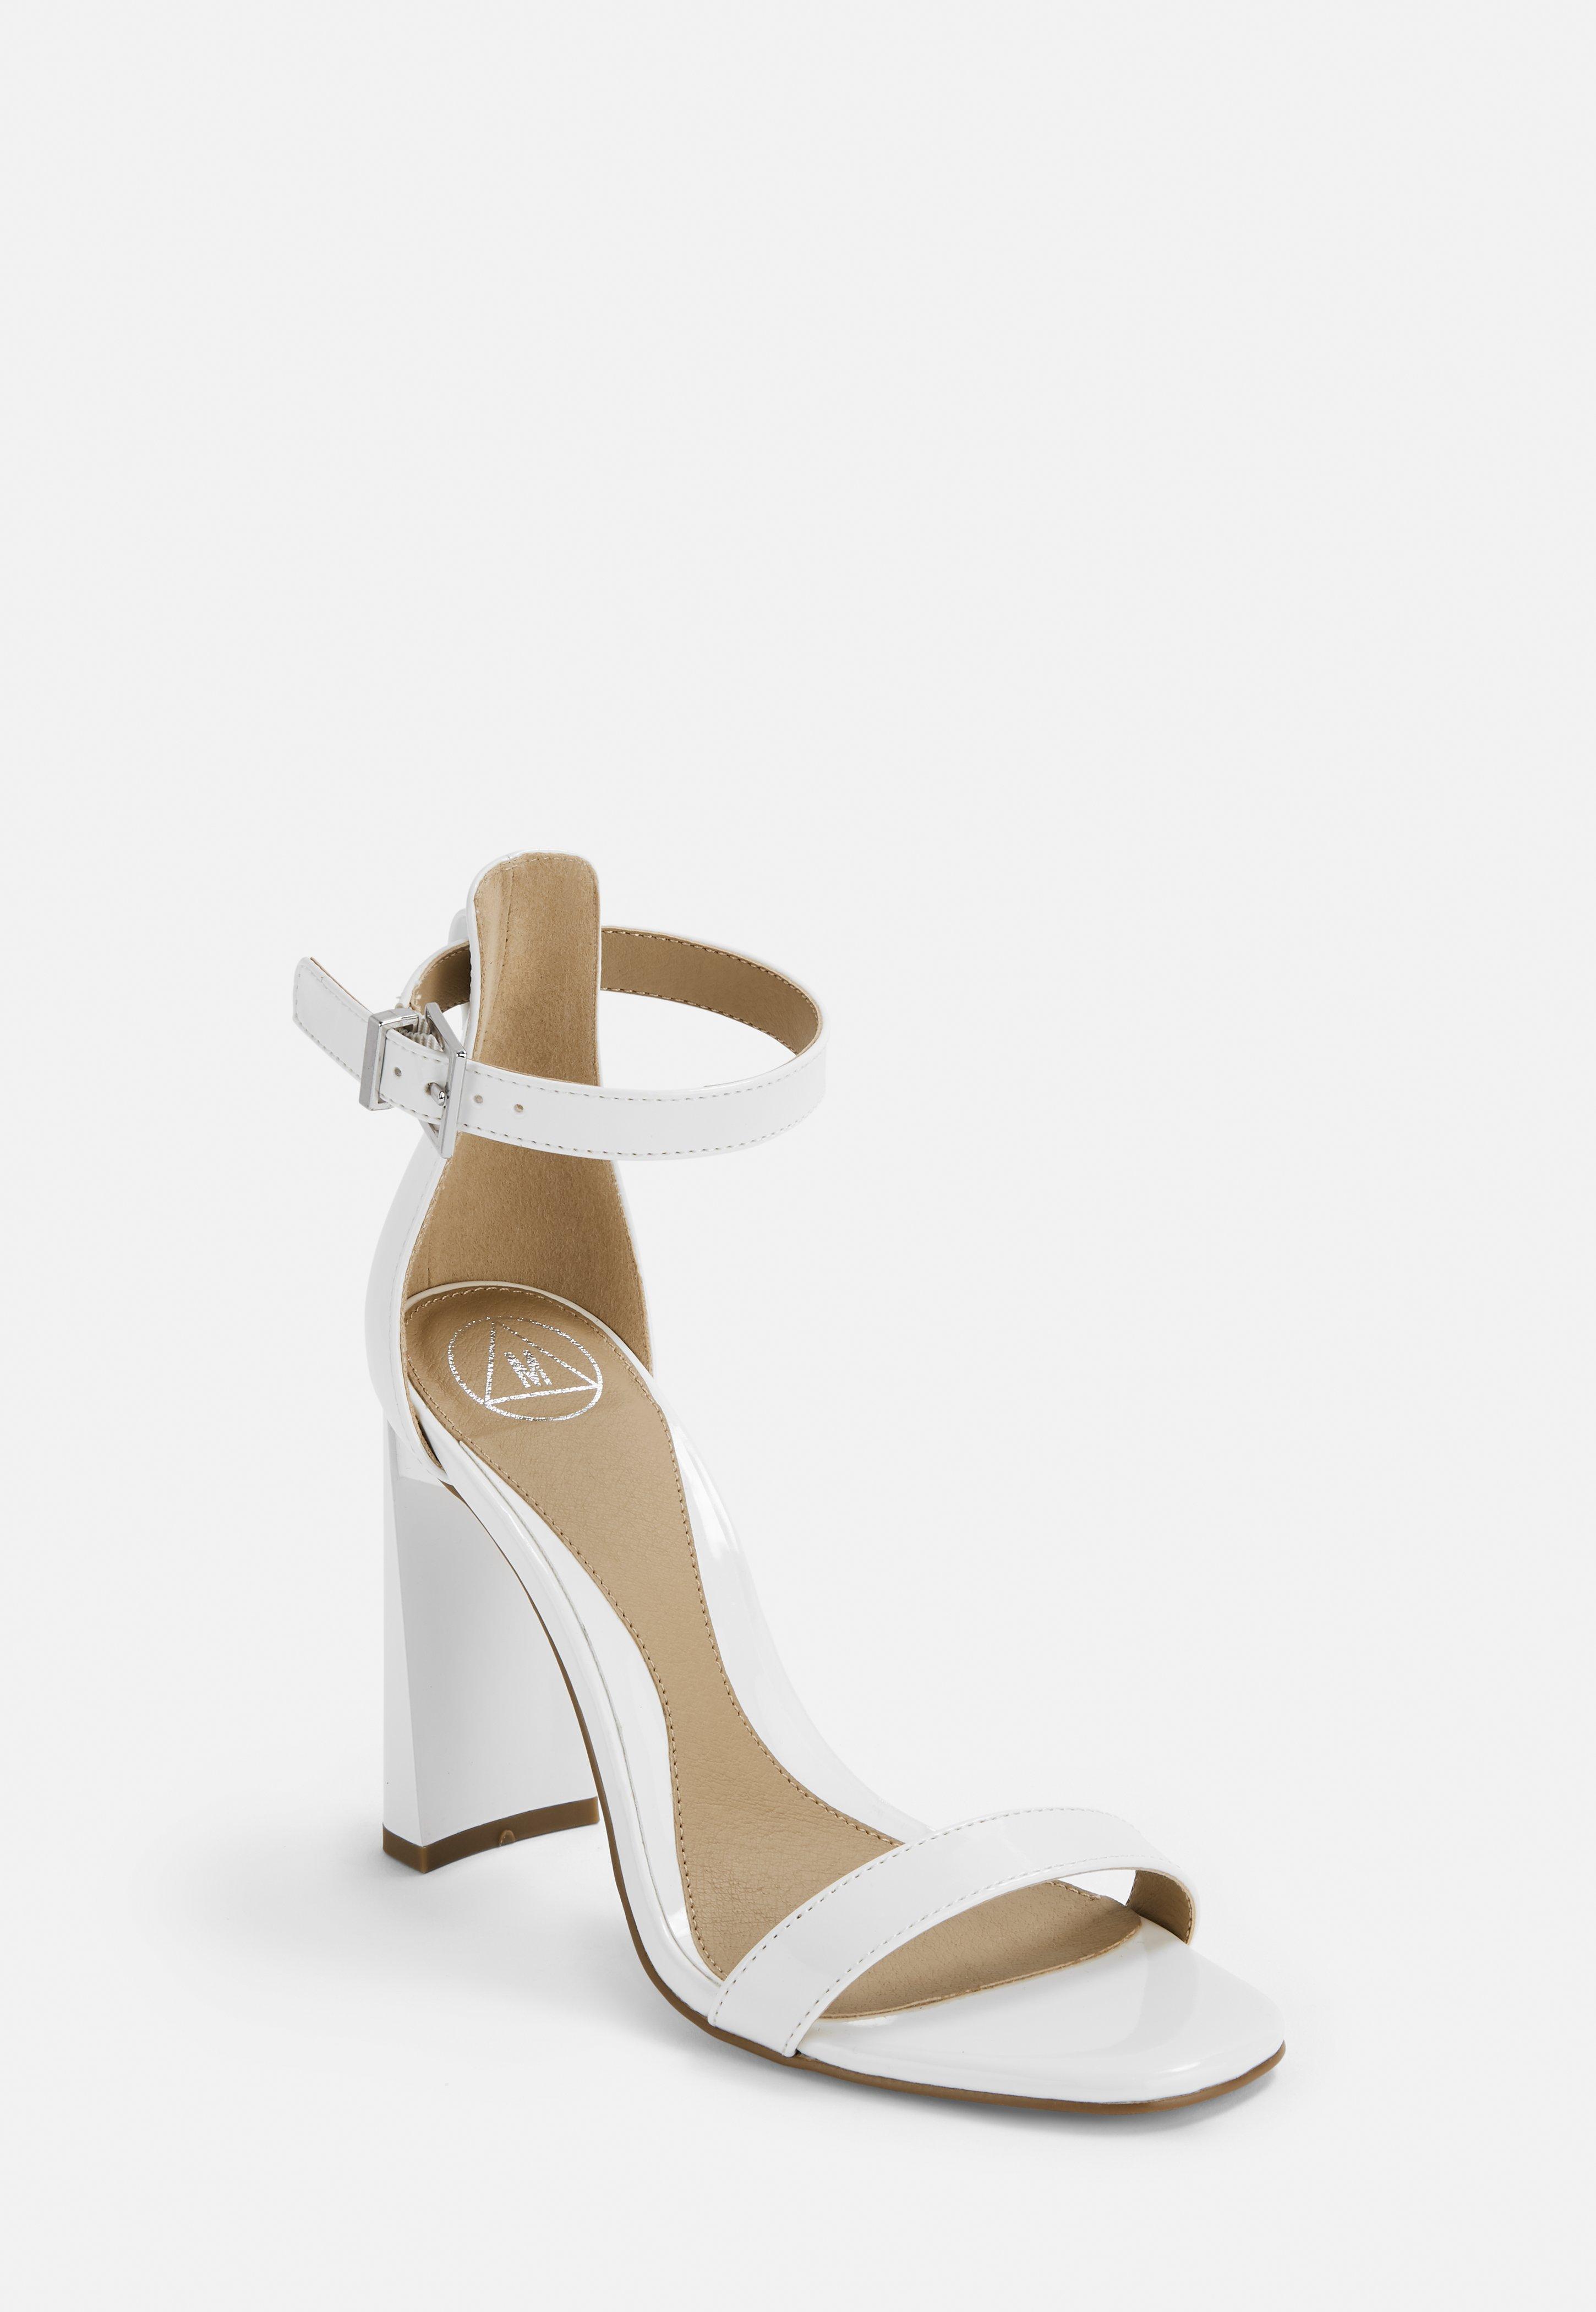 9659a40a39 High Heels & Stilettos | Strappy Heels Online - Missguided